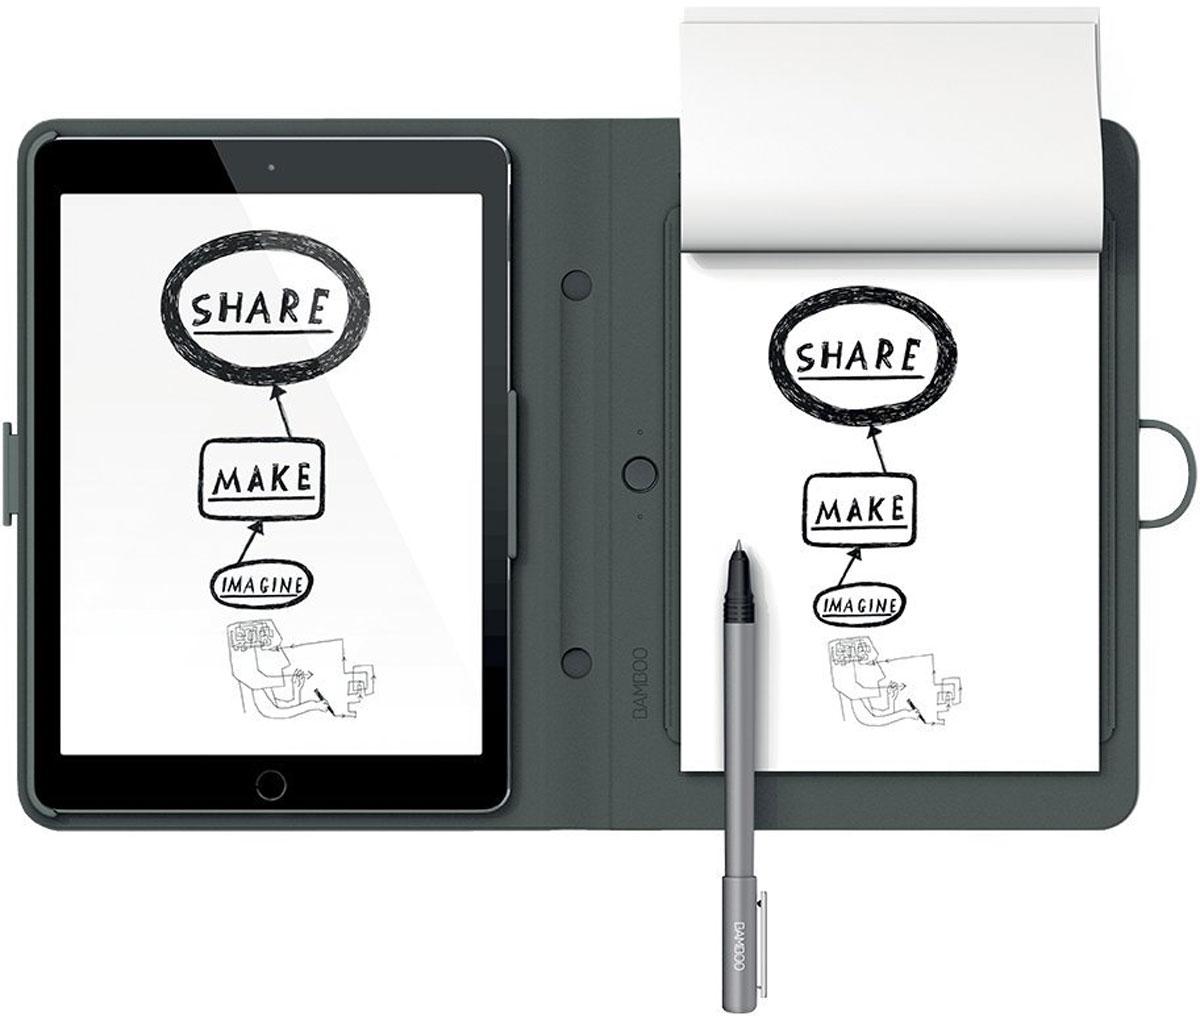 Wacom Bamboo Spark цифровой блокнот с карманом для iPad Air 2 (CDS-600C) ( 4949268619608 )